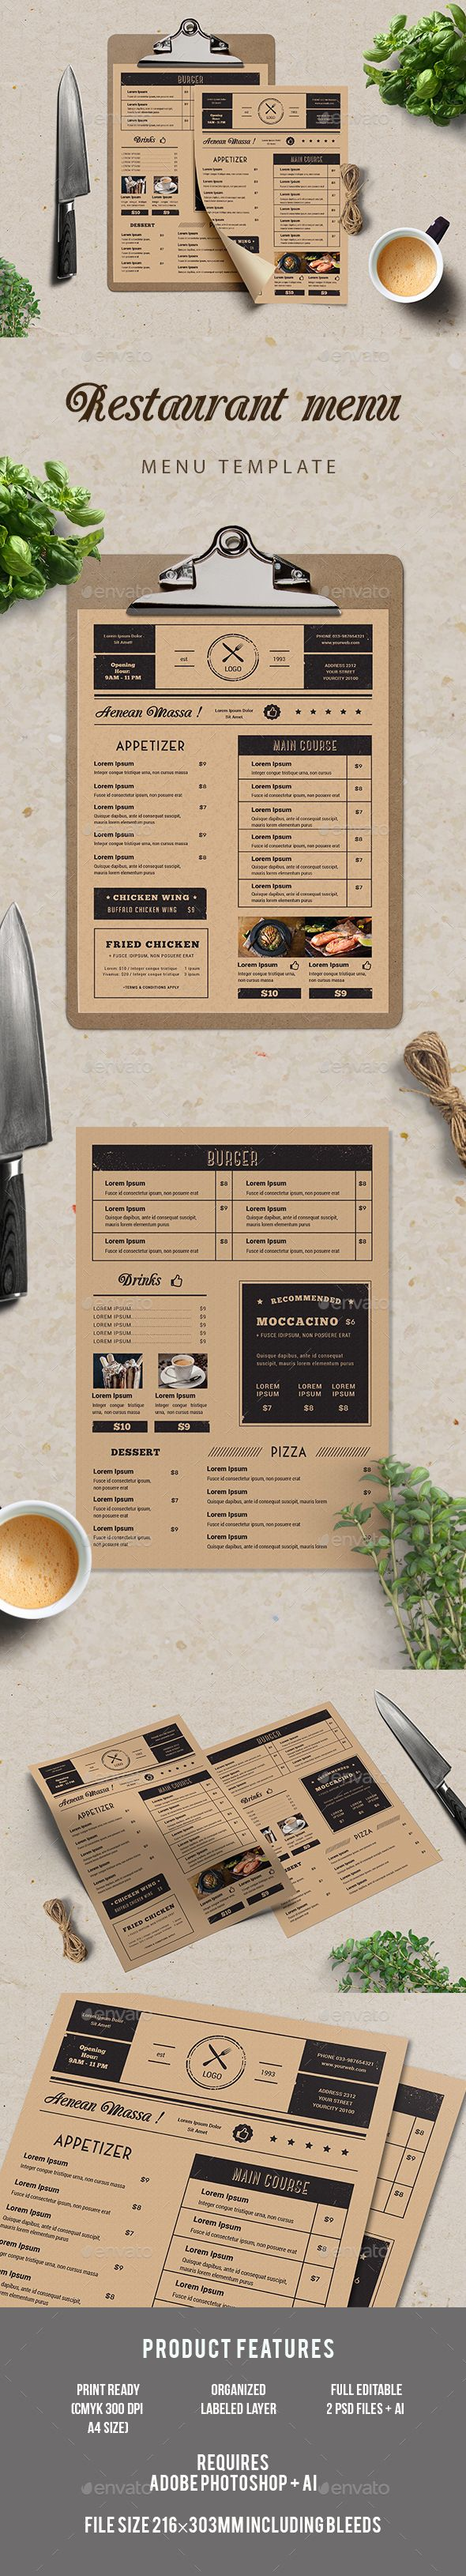 the 115 0 best menus templates restaurant menu ideas images on